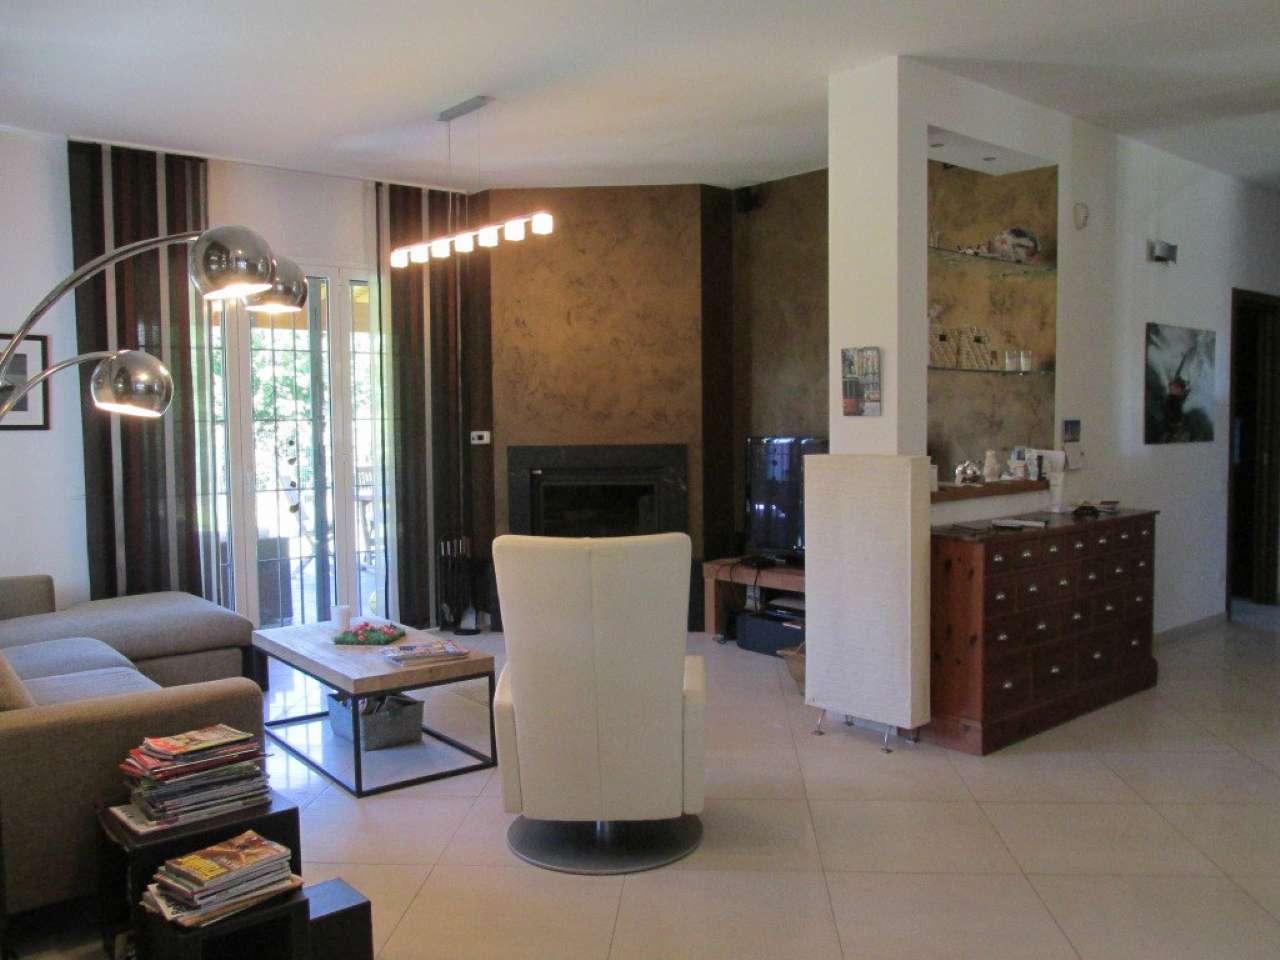 Villa in Vendita a Segrate: 5 locali, 300 mq - Foto 2